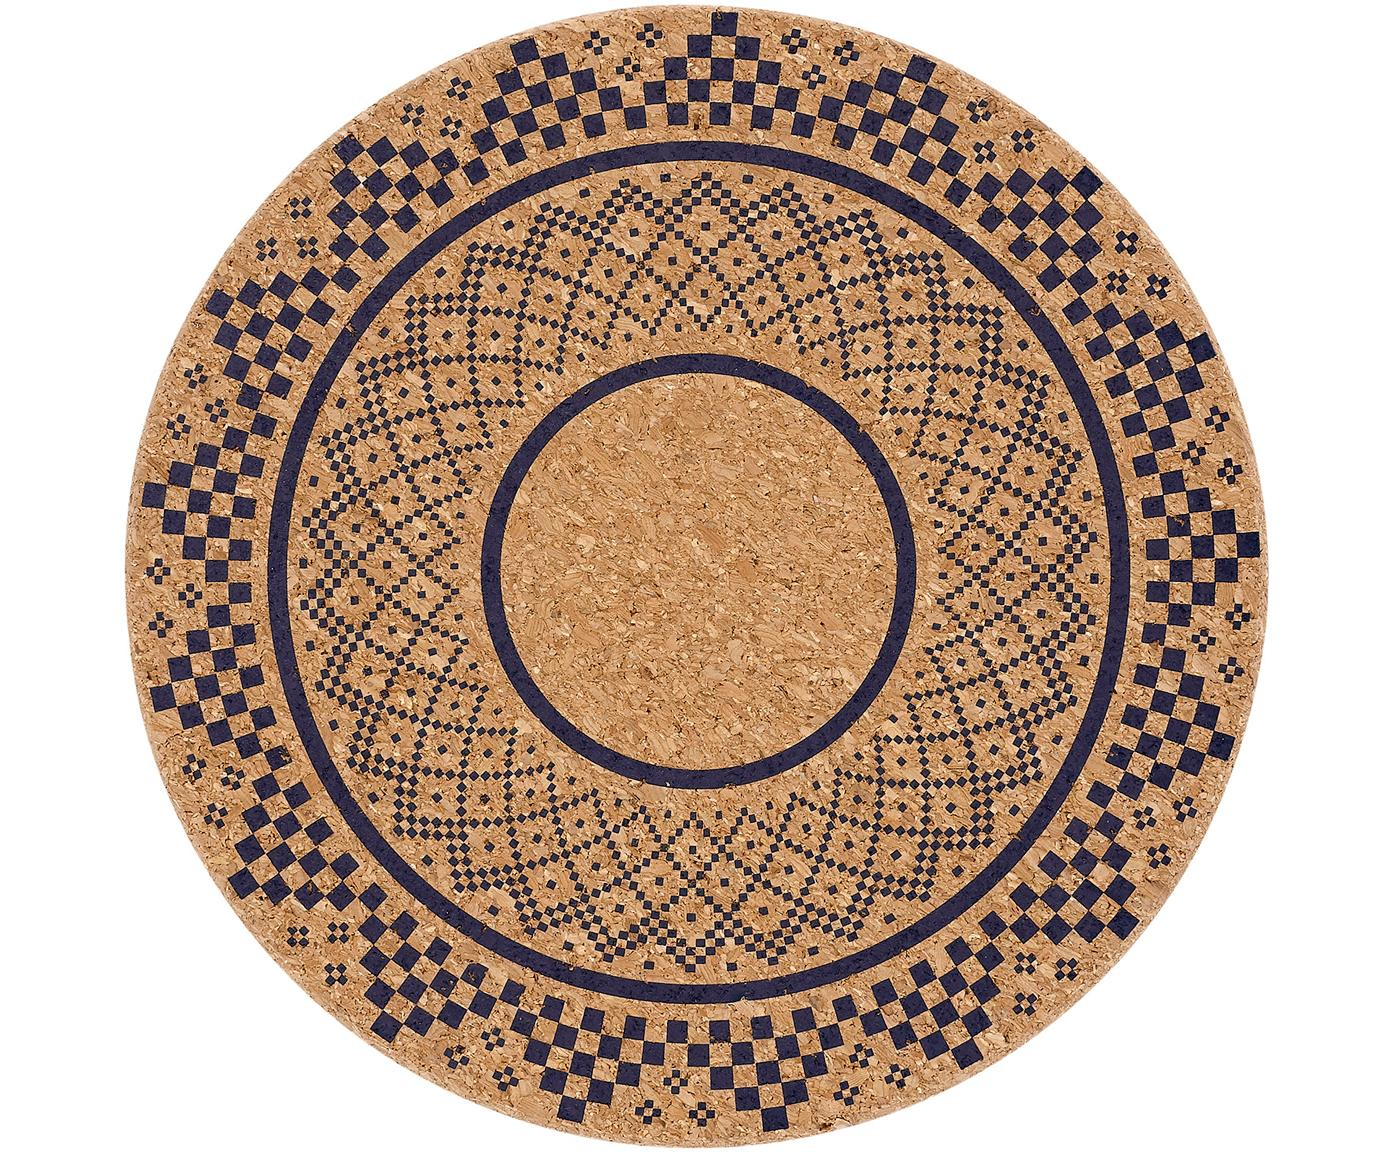 Kurken panonderzetters Arise, 2 stuks, Kurk, Kurkkleurig, donkerblauw, Ø 20 cm